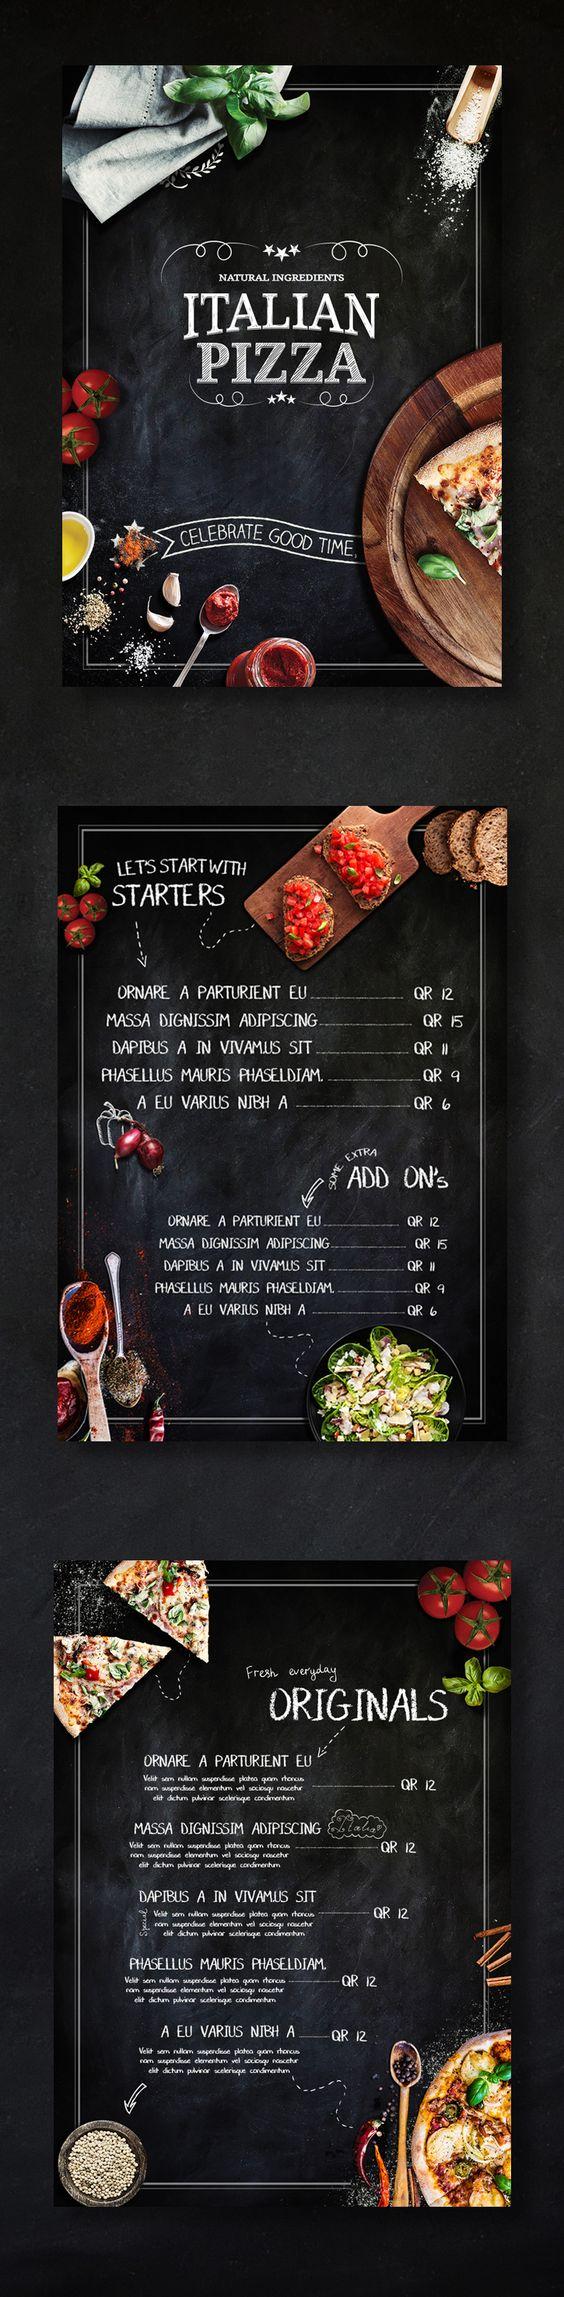 Pizza place menu on Behance